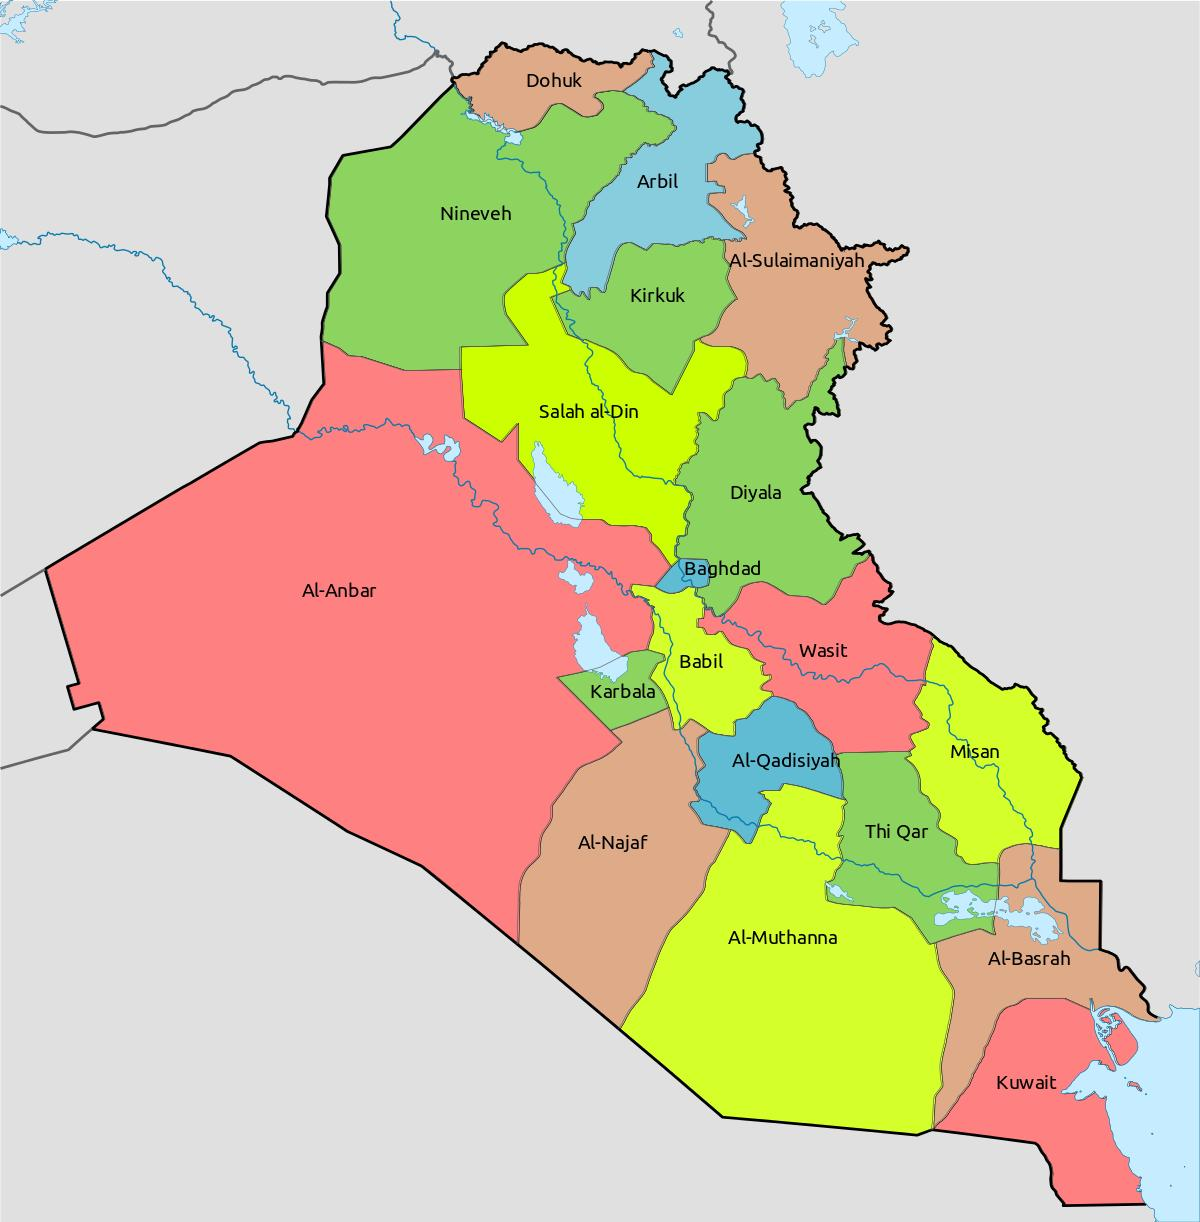 Kuwait map areas - Kuwait map with blocks (Western Asia - Asia)